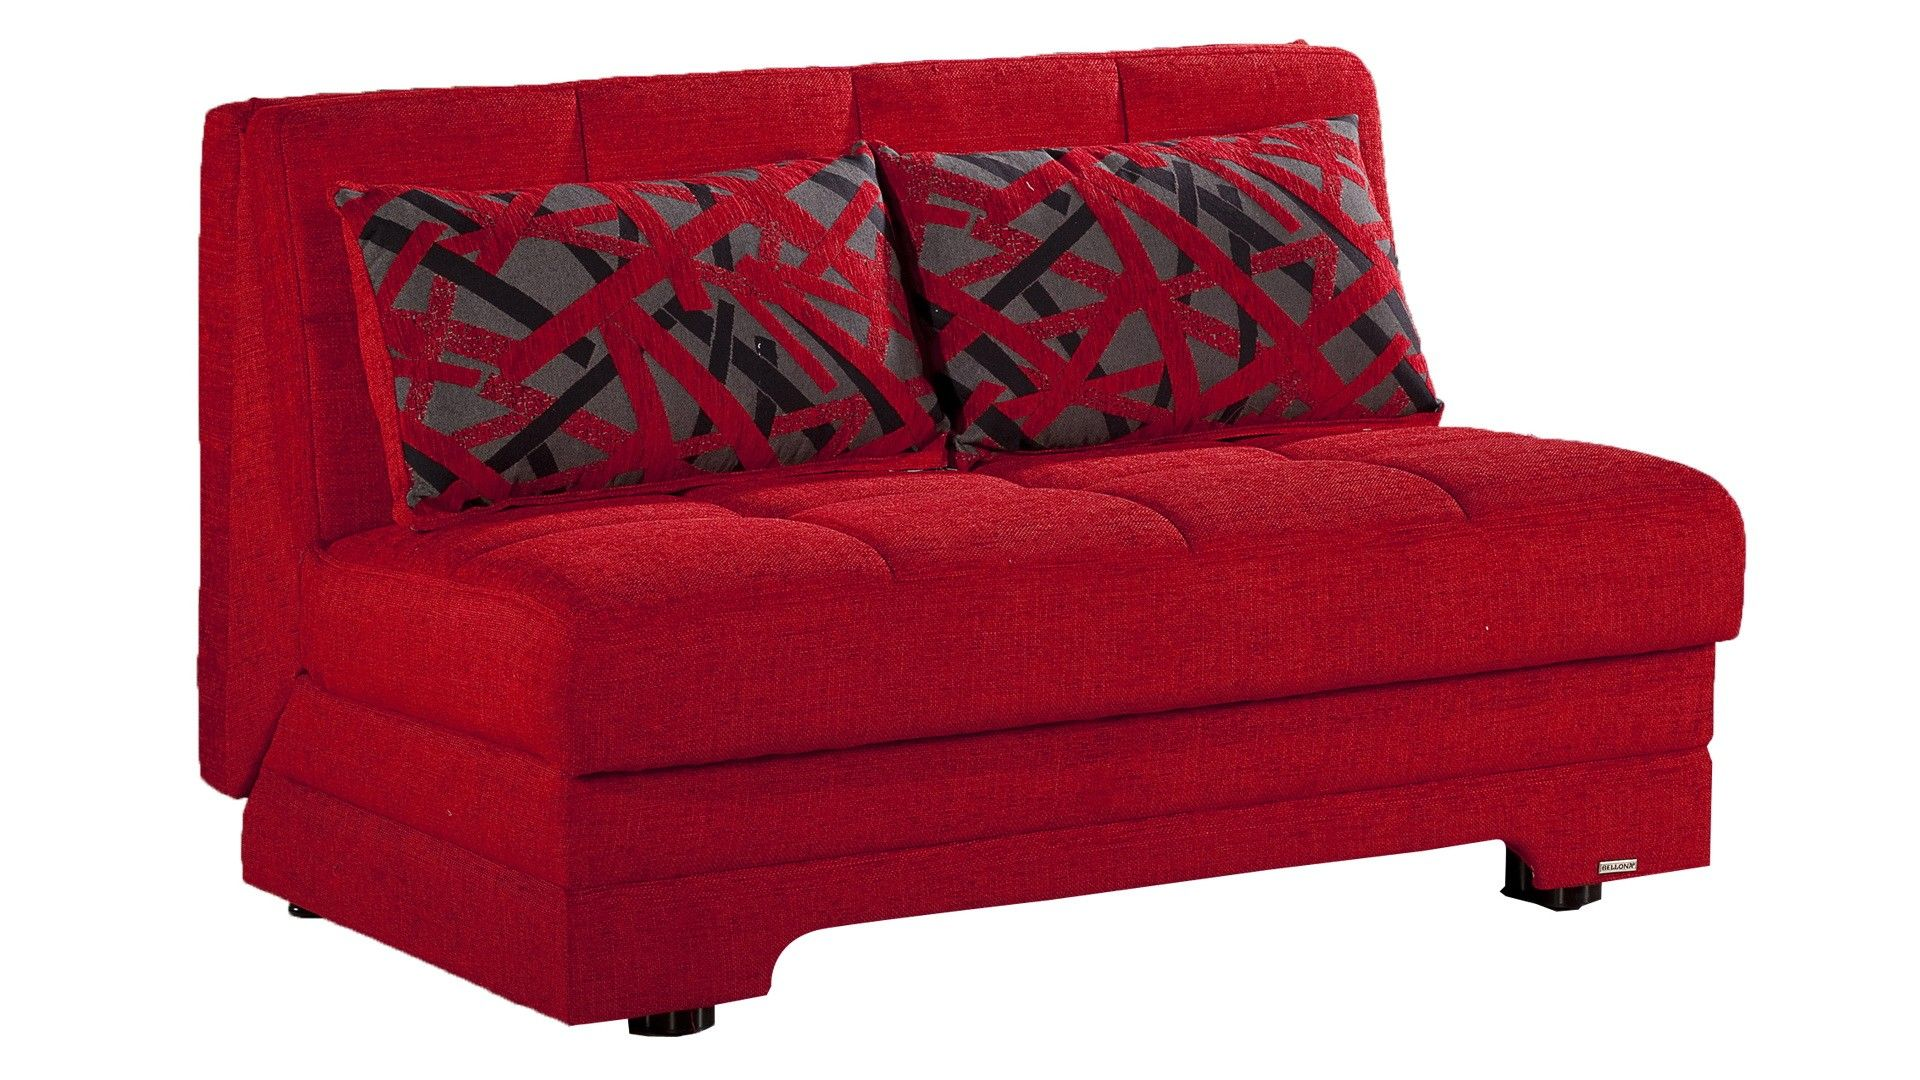 Phenomenal Sunset Twist Sofa Bed Story Red Sofa Bed Loveseat Inzonedesignstudio Interior Chair Design Inzonedesignstudiocom